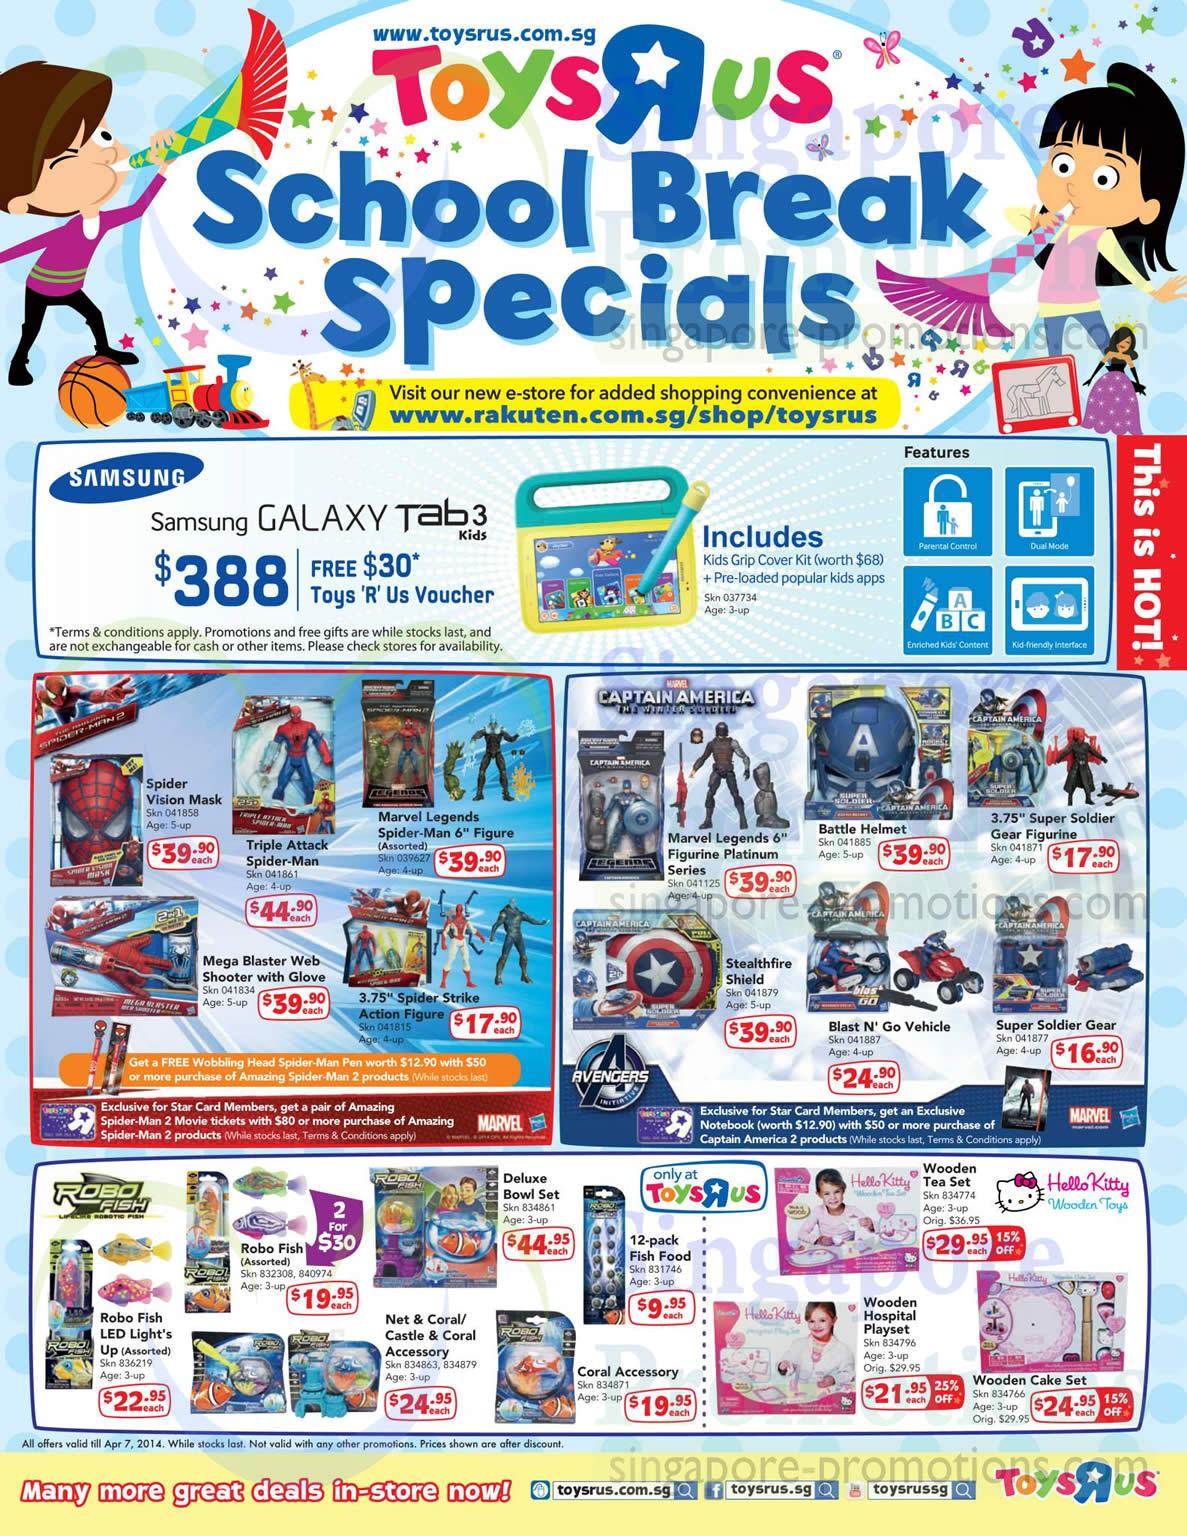 School Break Specials, Spider Man, Captain America, Robo Fish, Hello Kitty